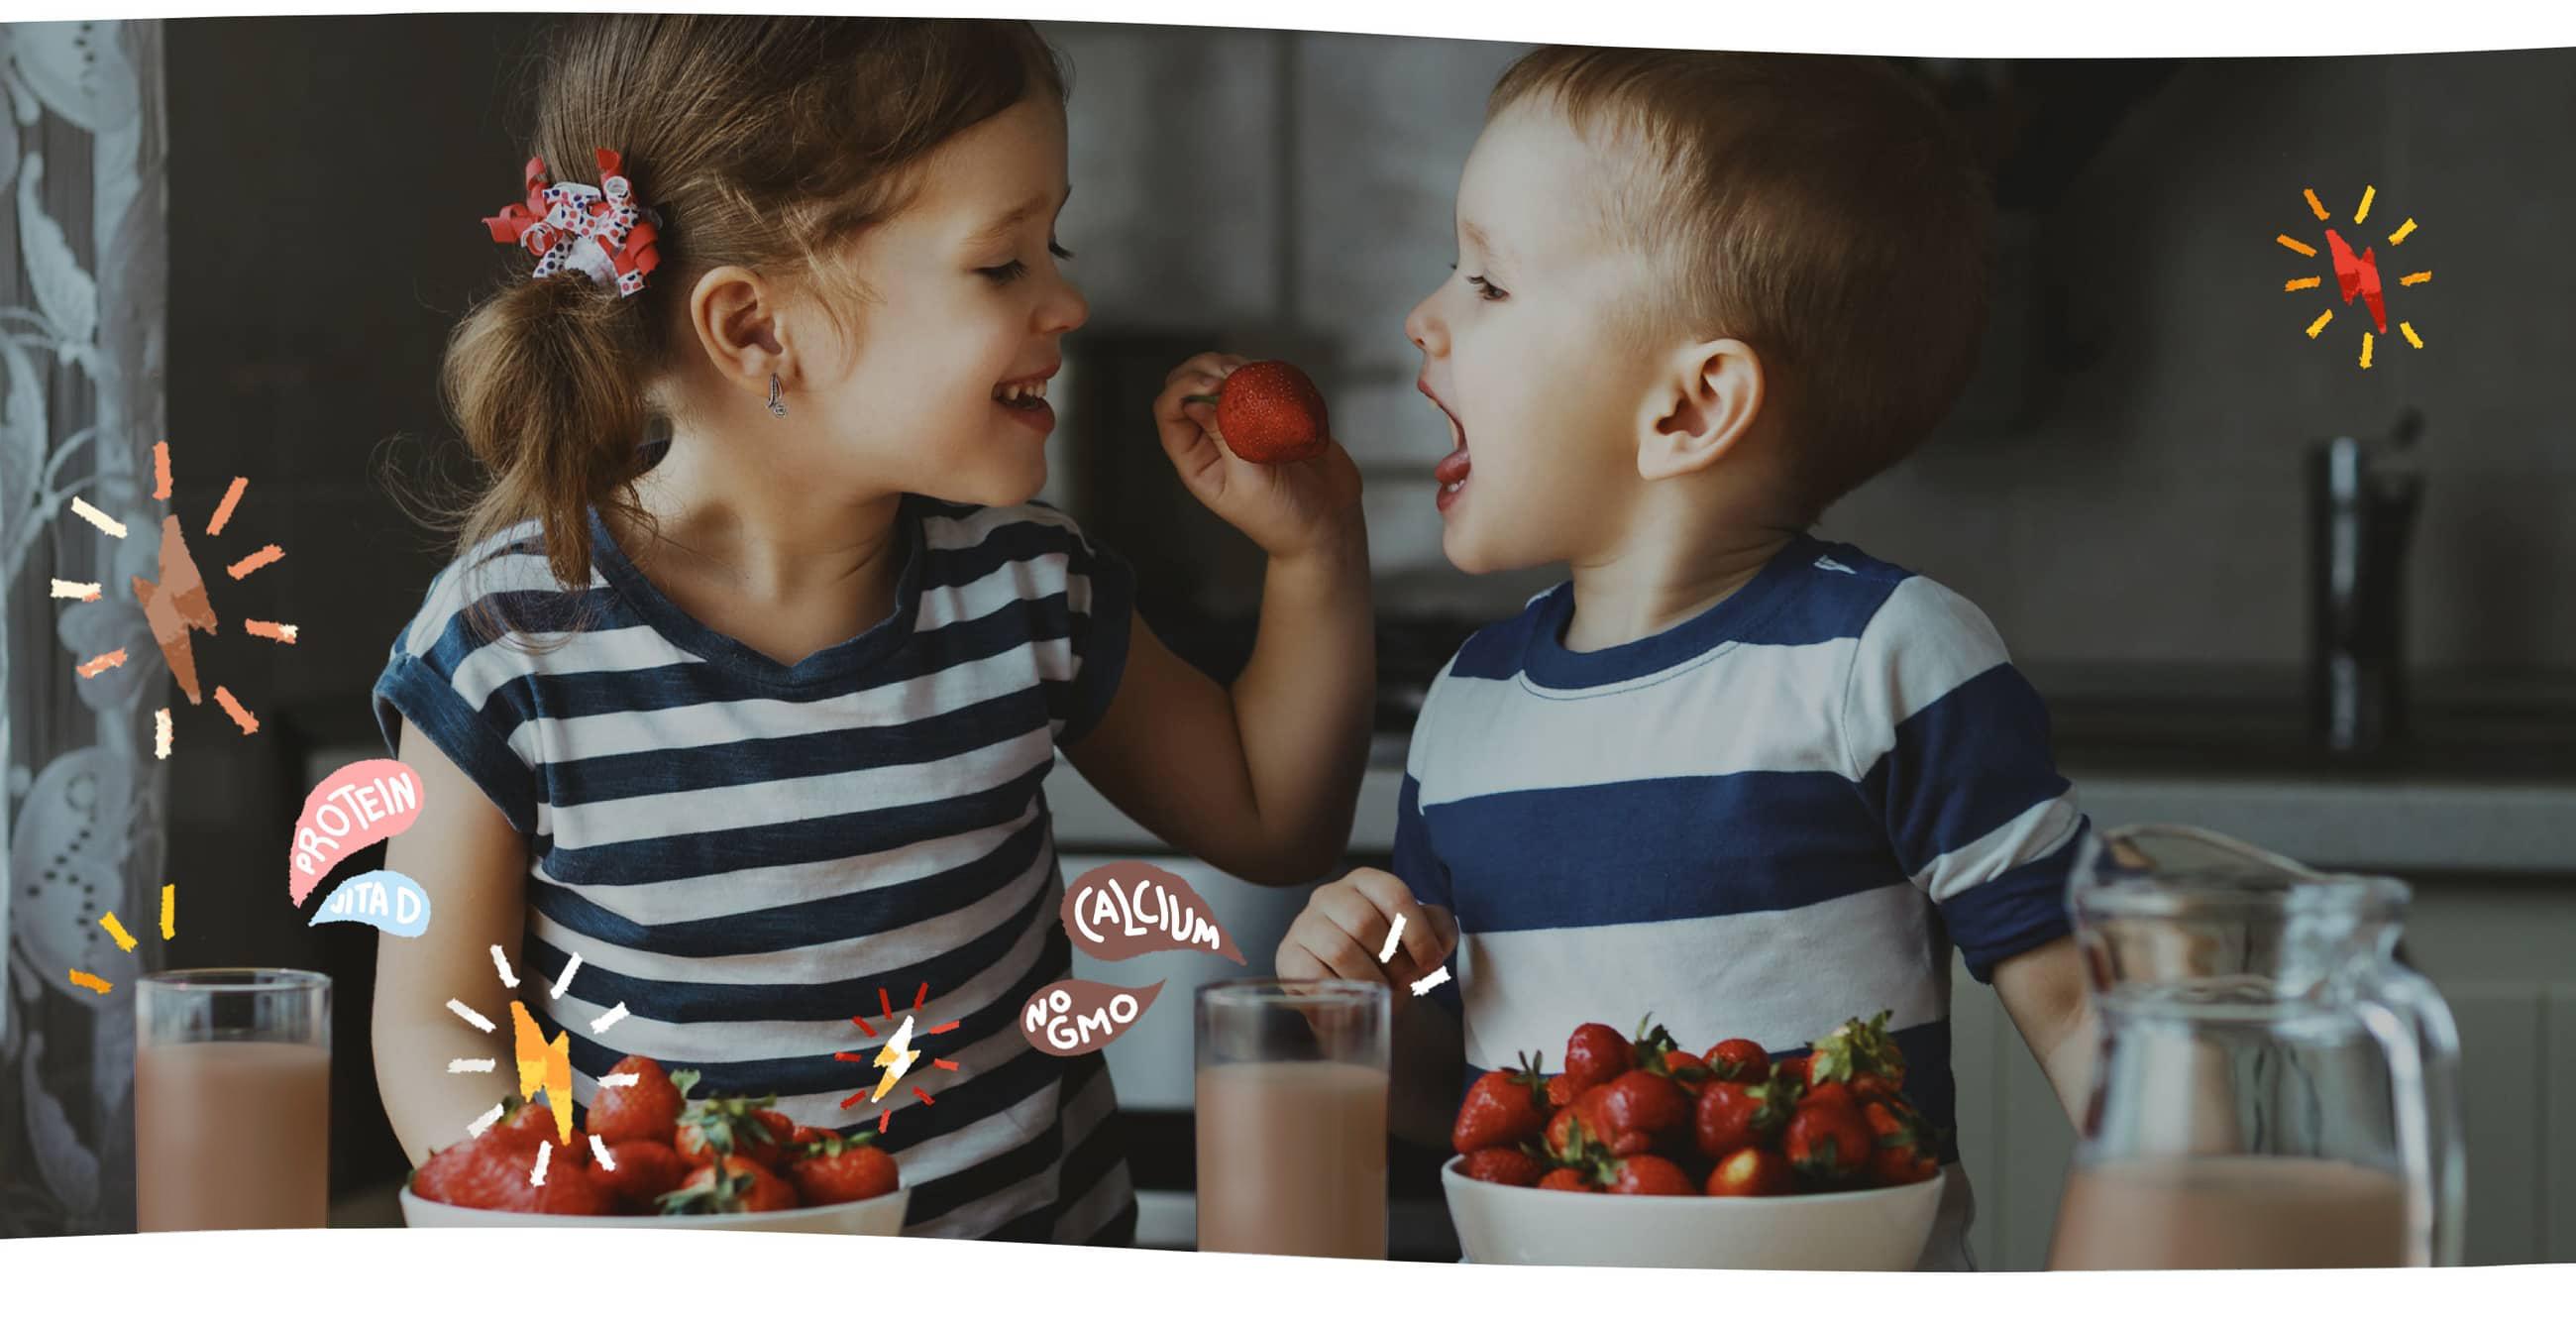 girl feeding strawberry to boy